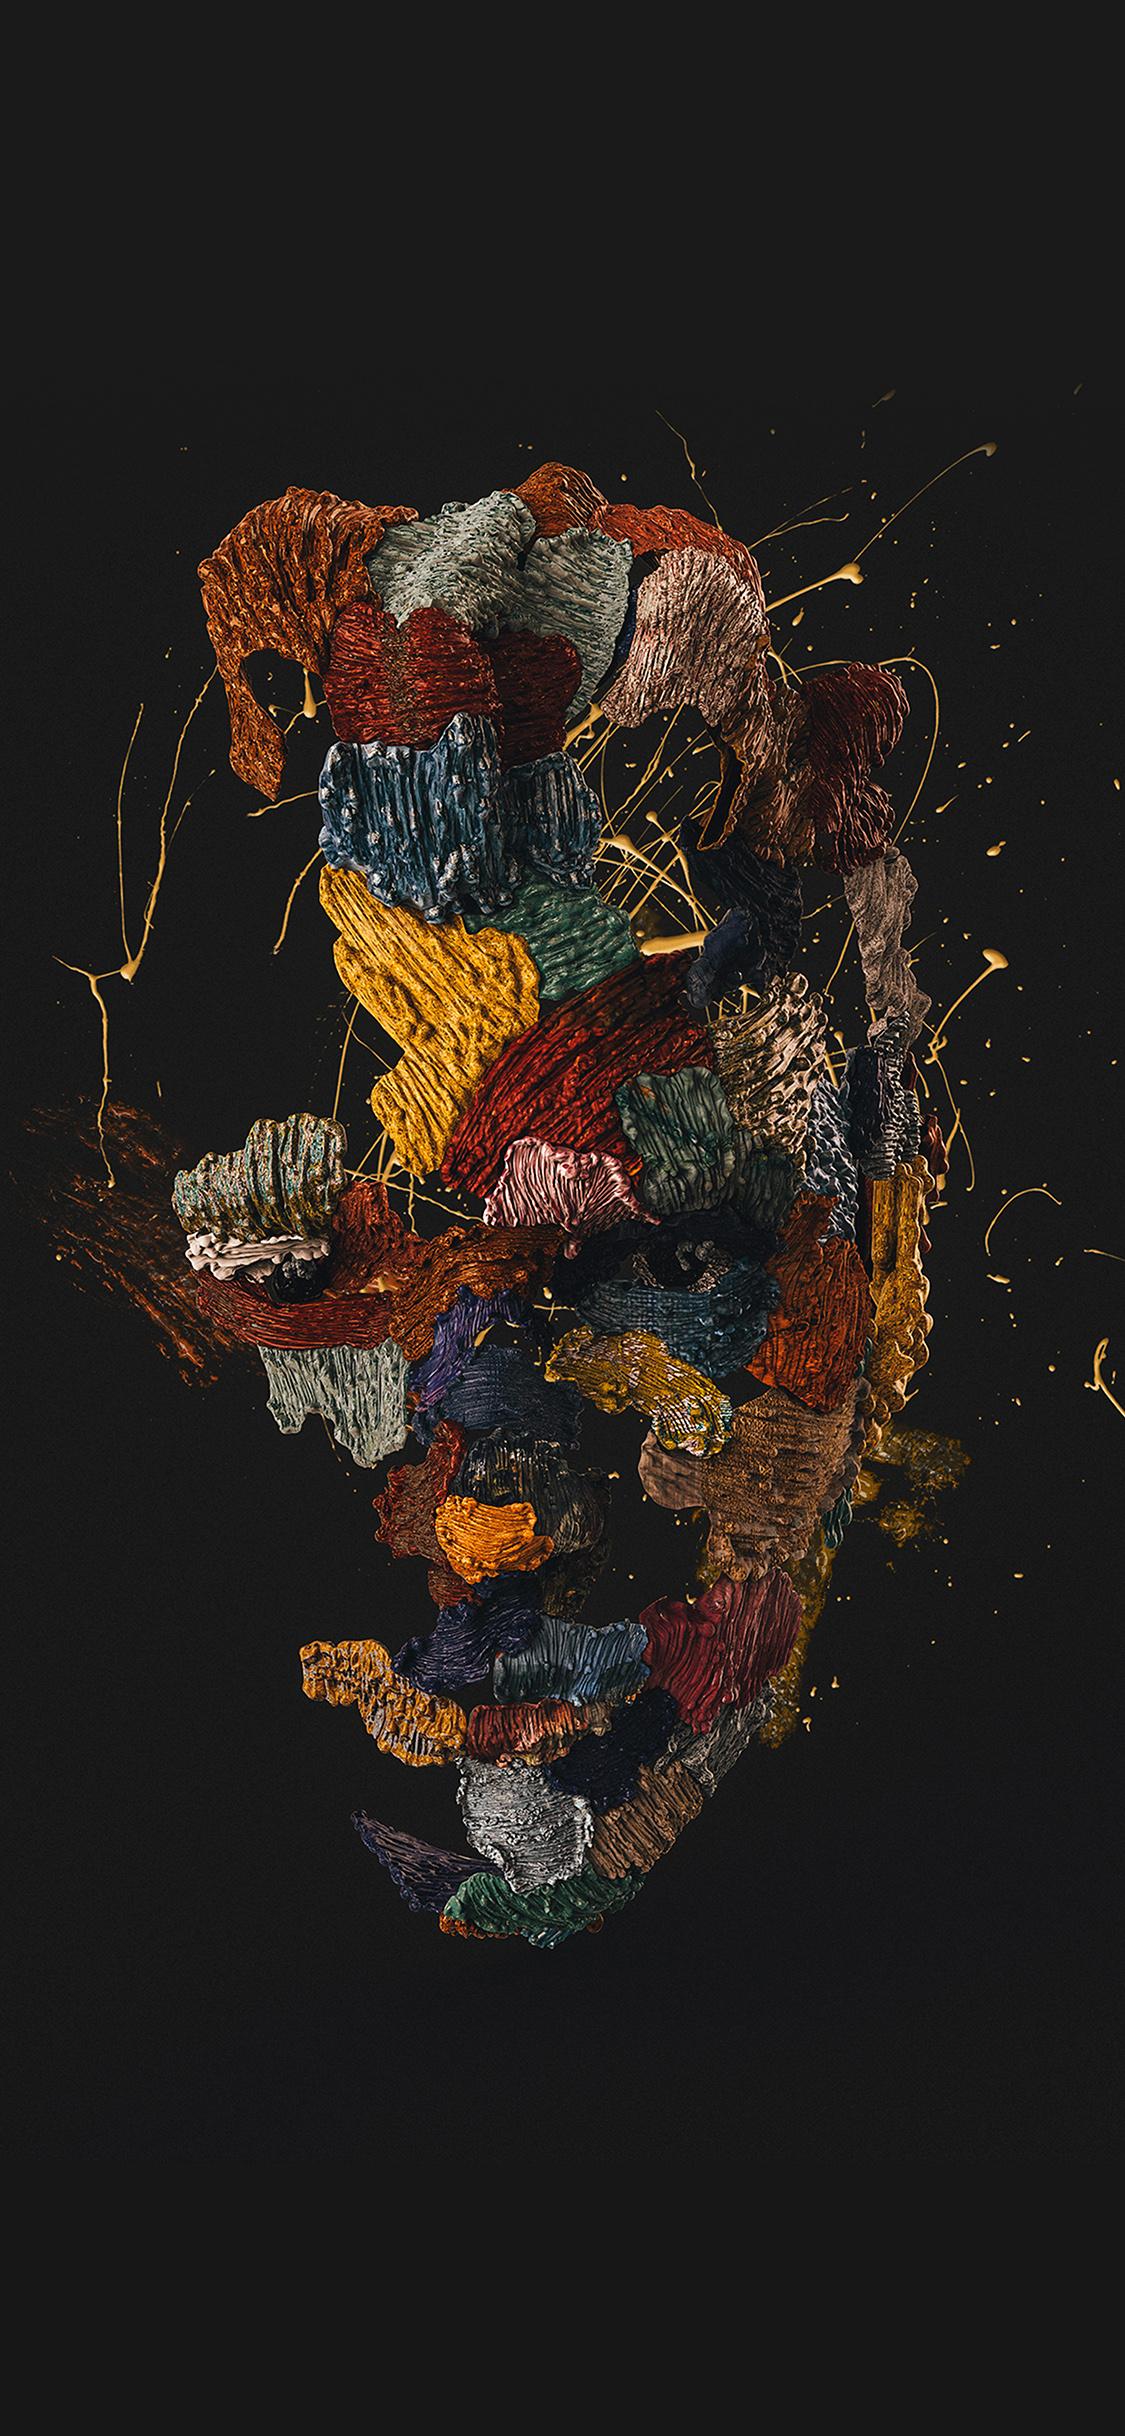 ... Face Dark Illustration Art IPhone X Wallpaper.